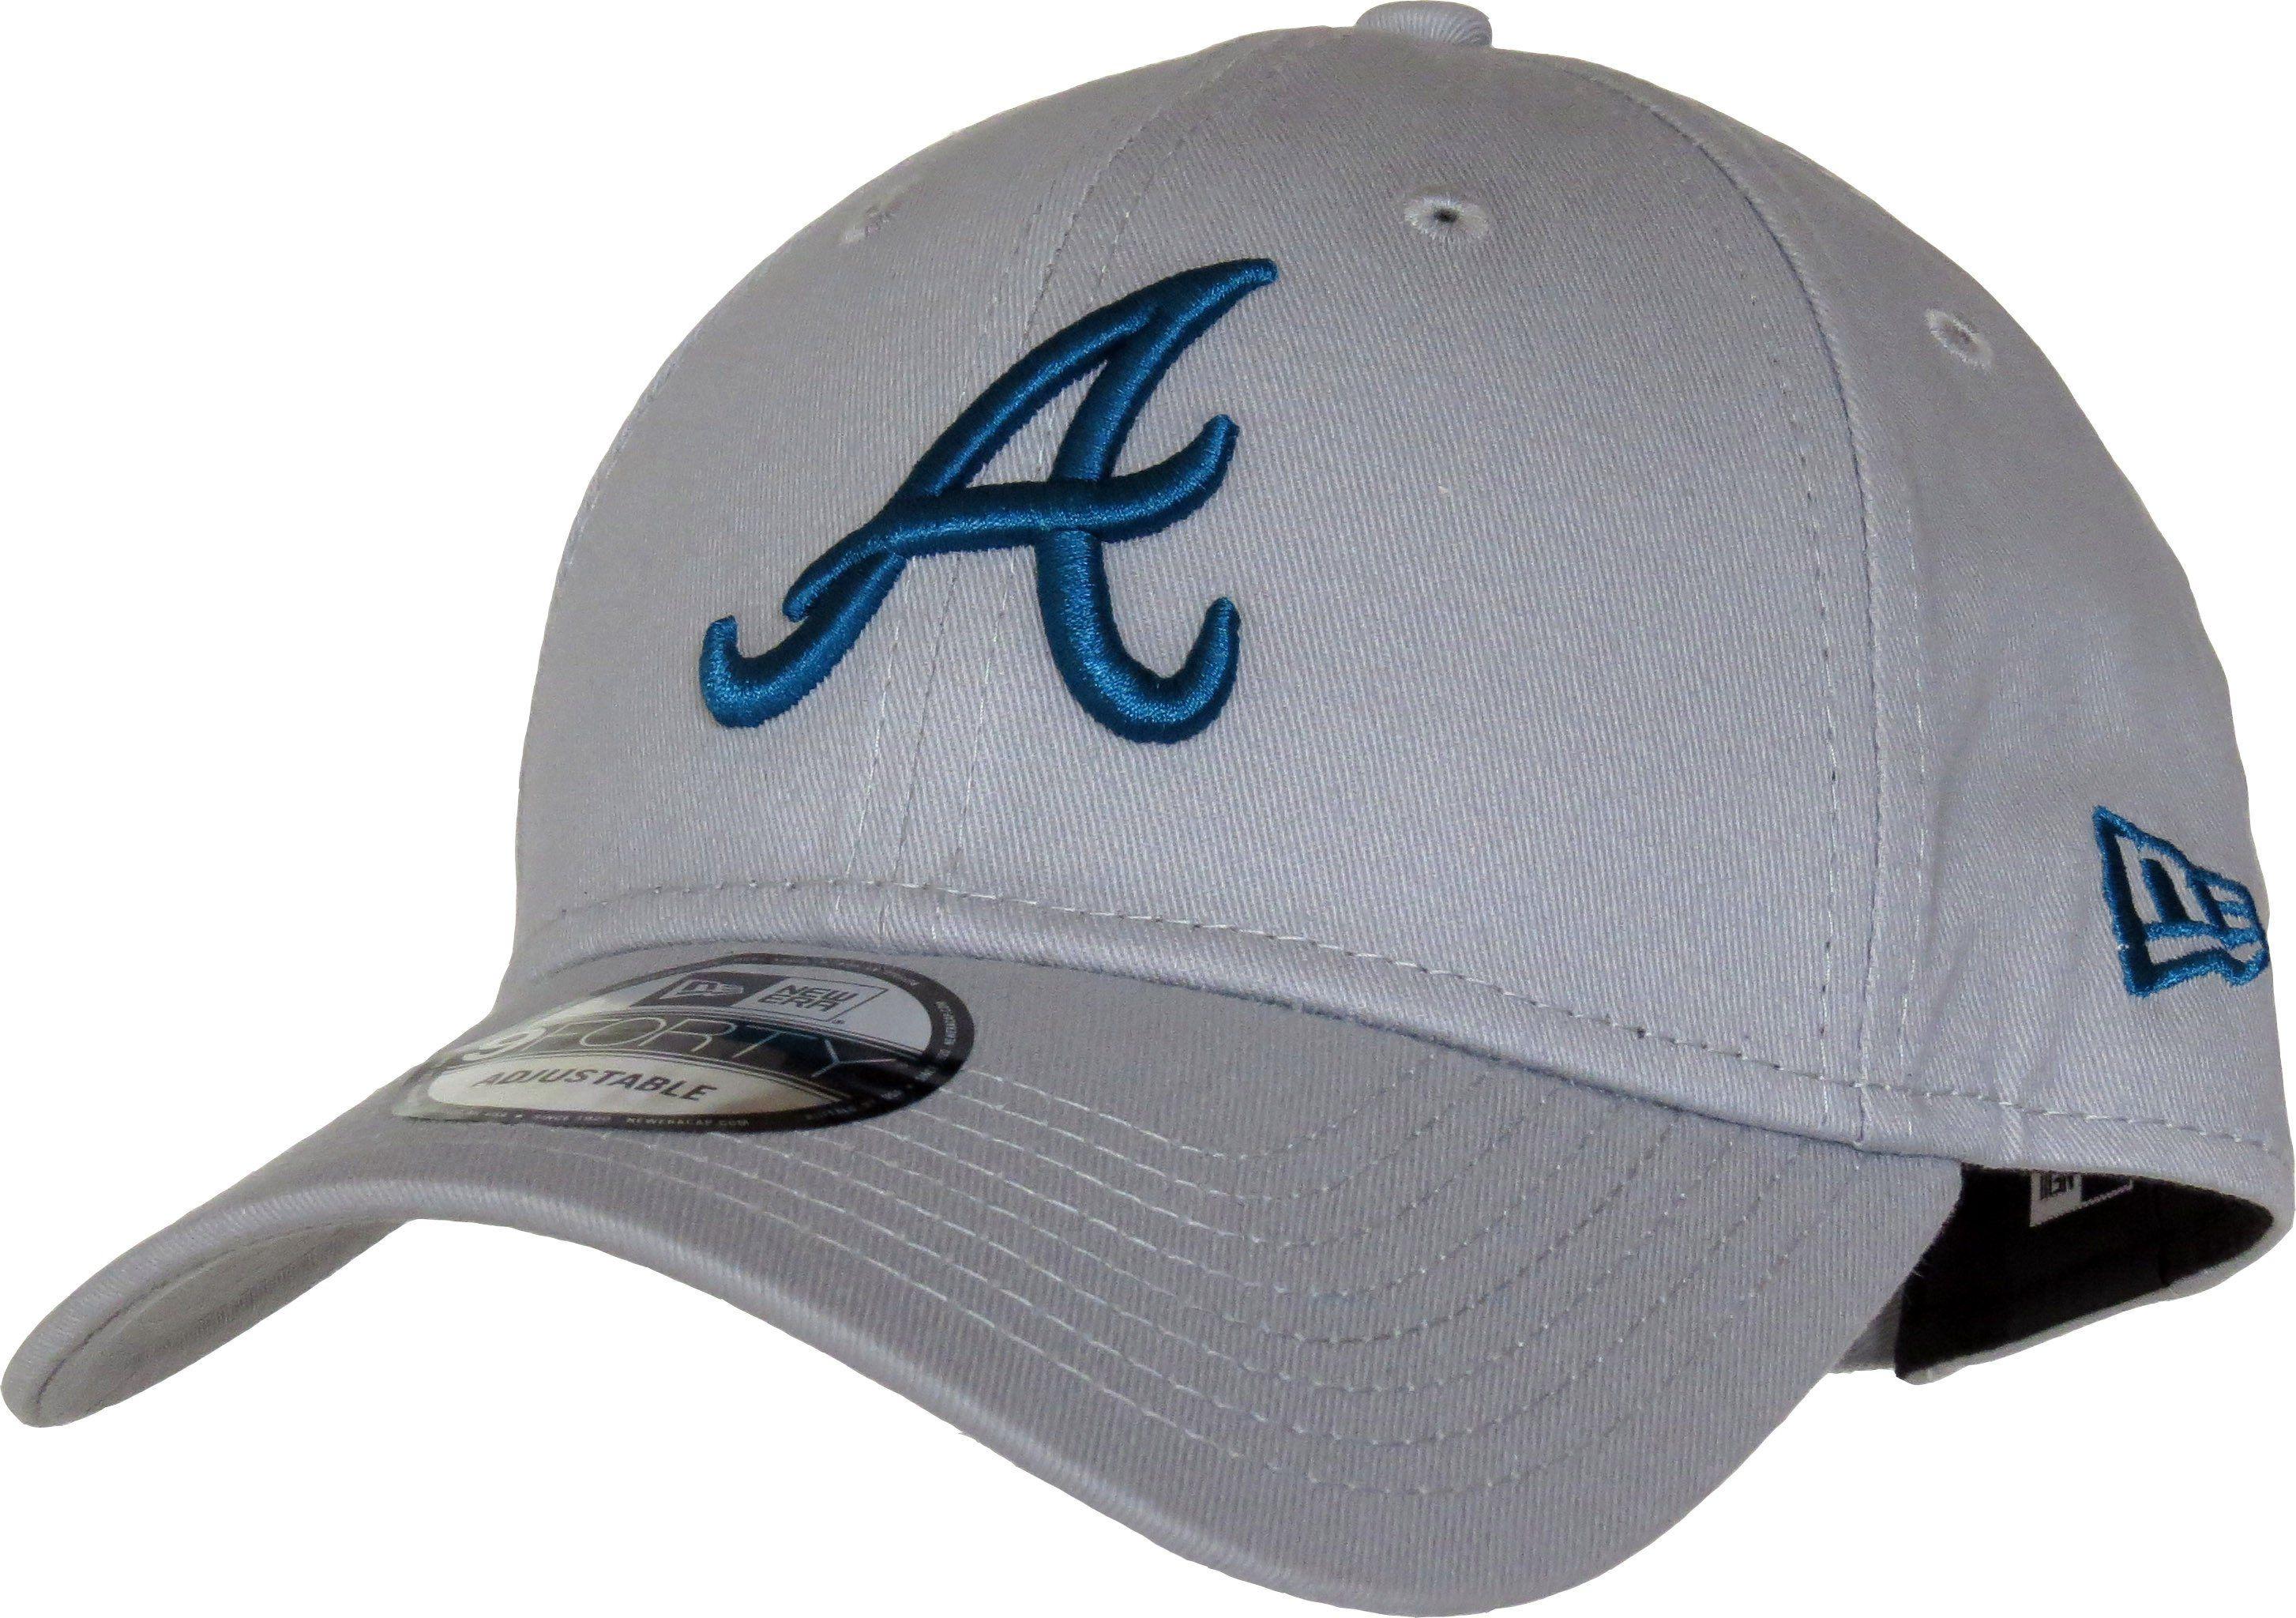 b0e9d5f3f4d1e ... ebay new era 940 league essential atlanta braves baseball cap grey with  the blue atlanta braves